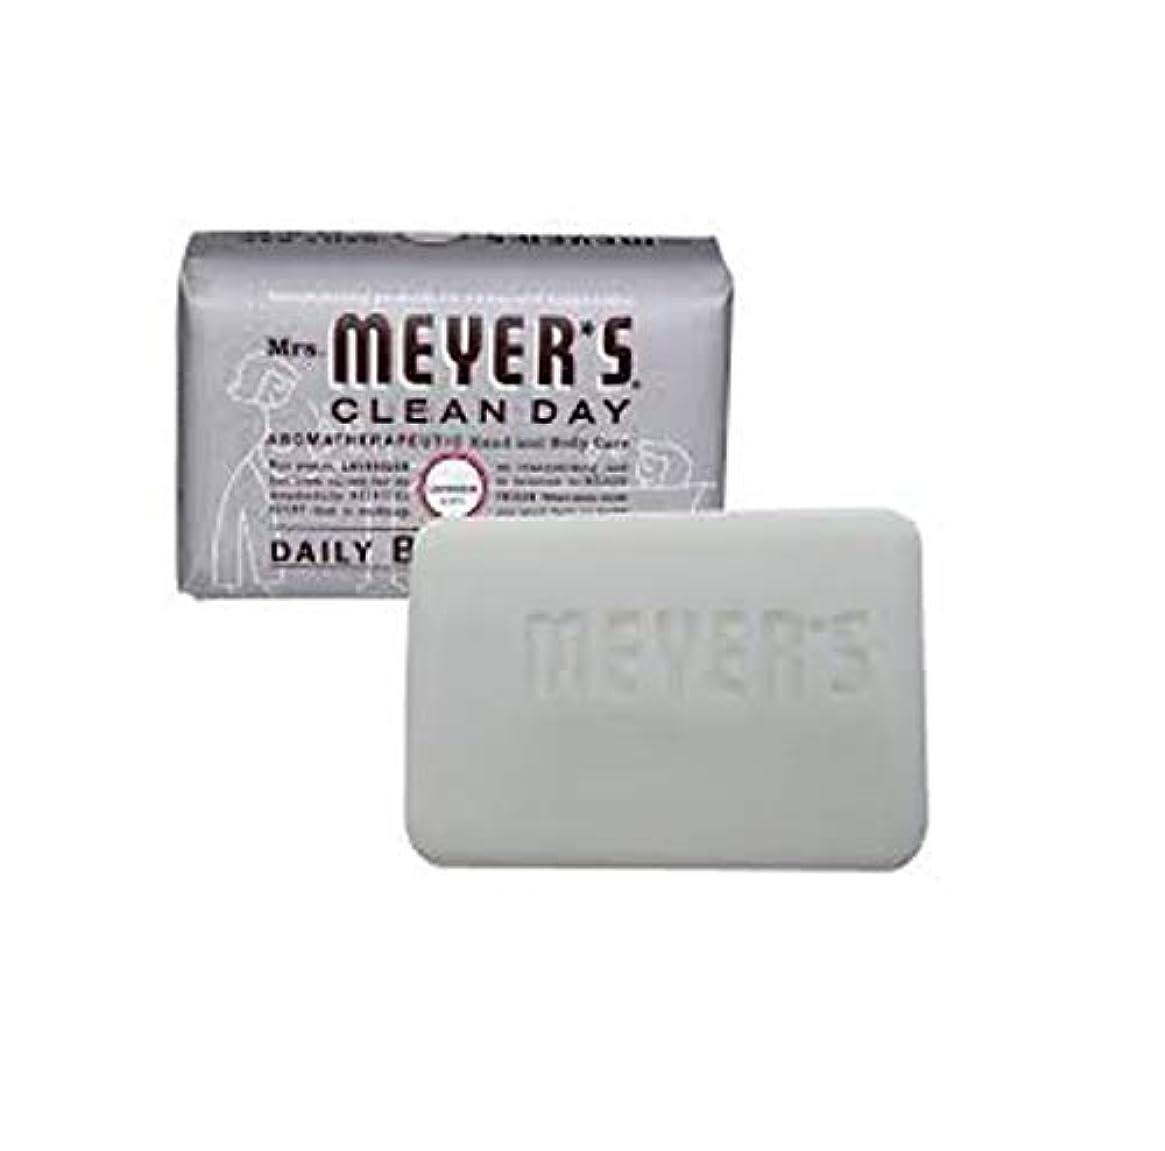 2 Packs of Mrs. Meyer's Bar Soap - Lavender - 5.3 Oz by Mrs. Meyer's Clean Day